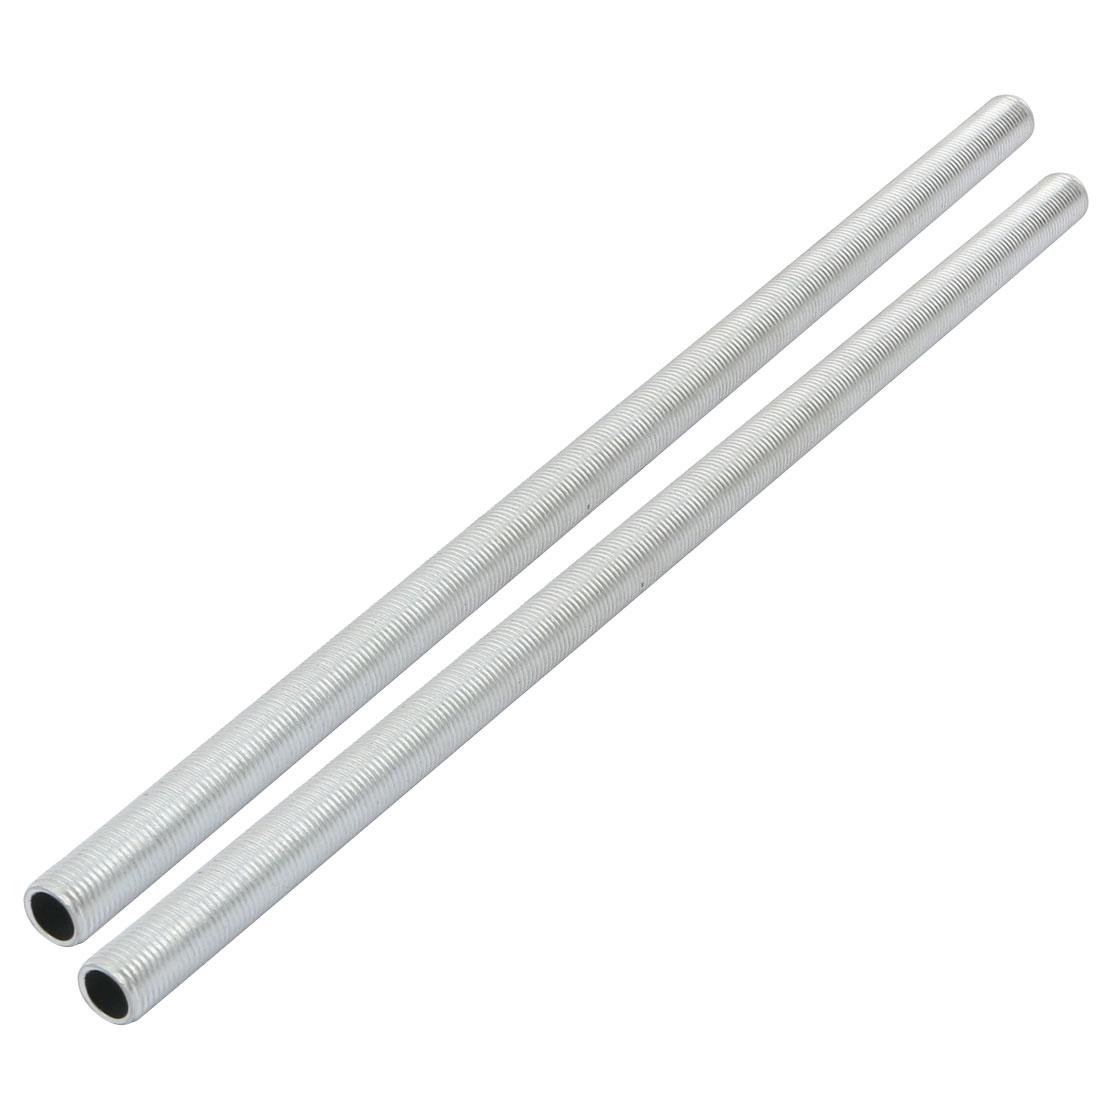 Metric M10 1mm Pitch Thread Zinc Plated Pipe Nipple Lamp Parts 255mm Long 2pcs